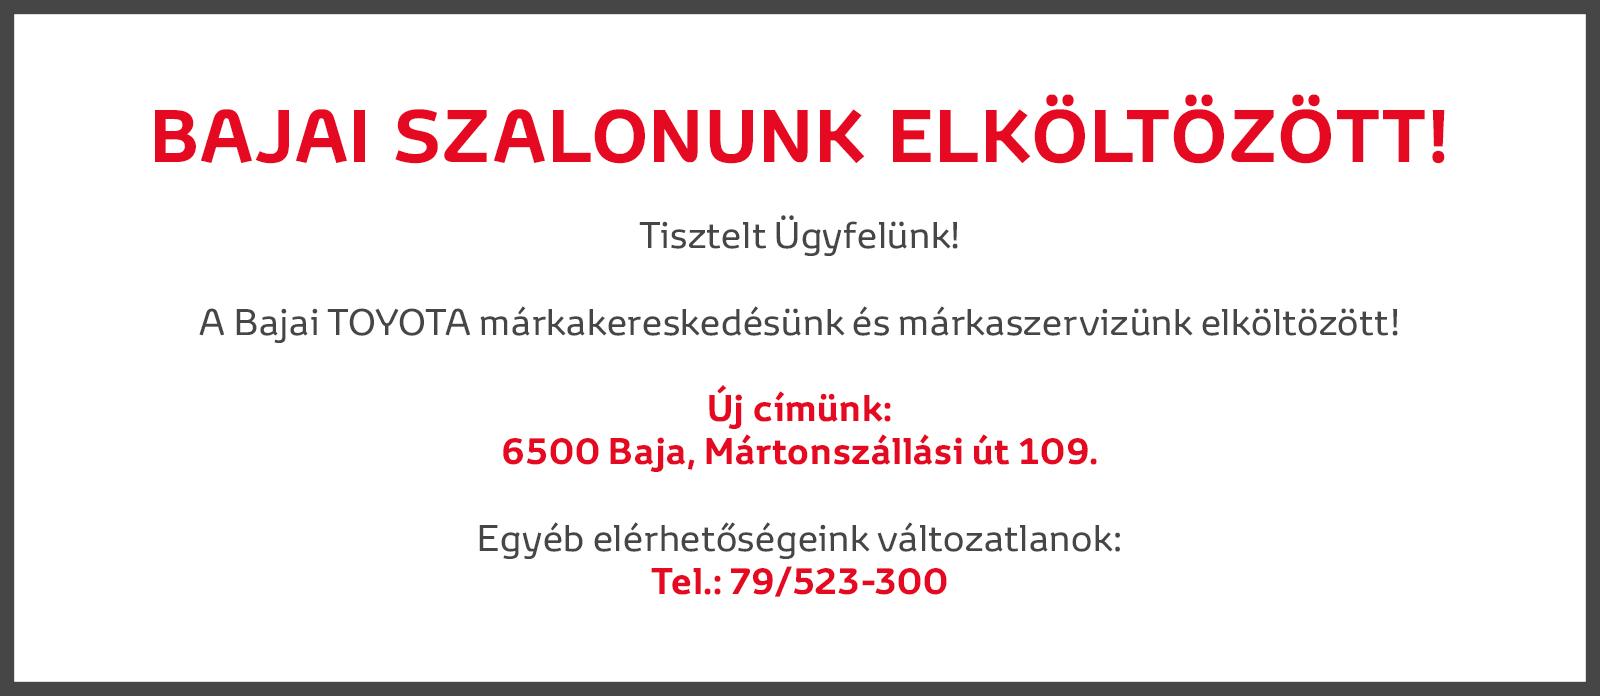 koltozes_2020_2